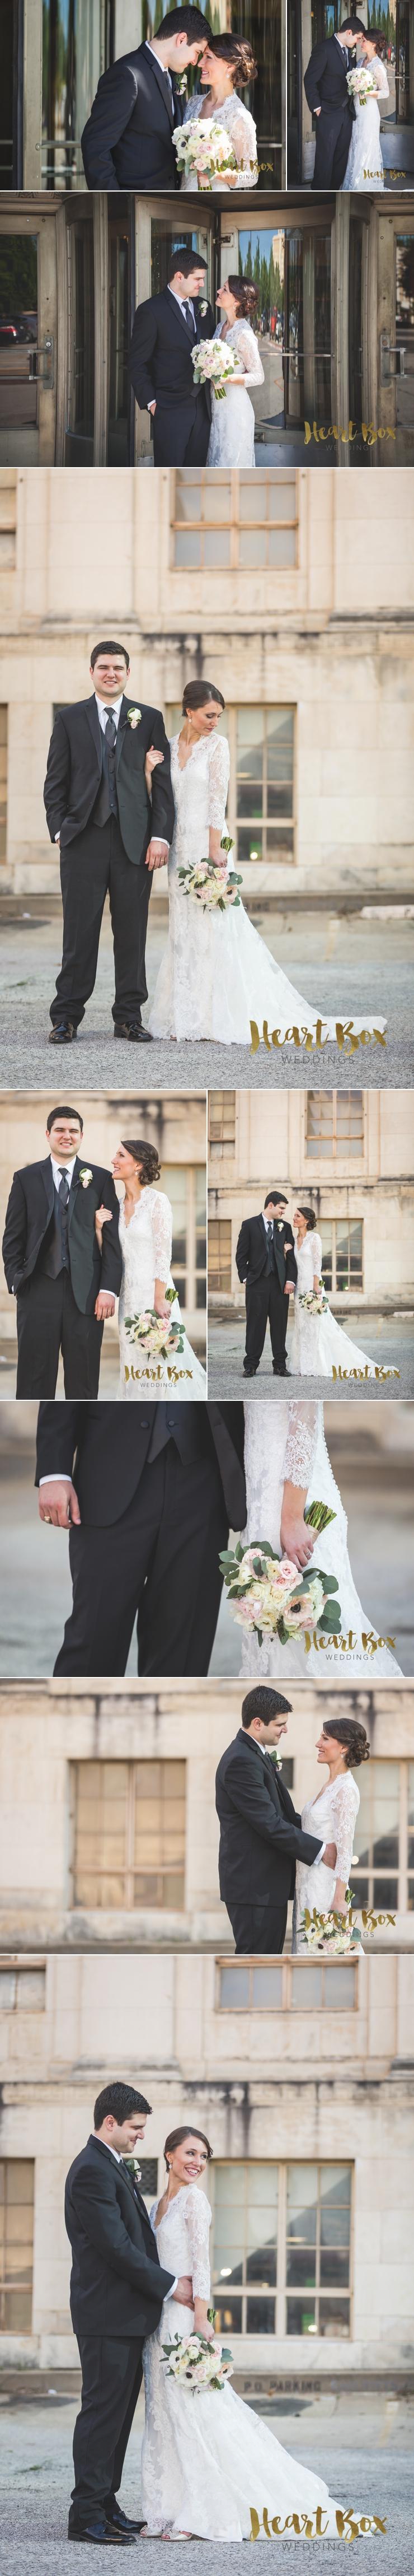 Fegan Wedding Blog Collages 10.jpg